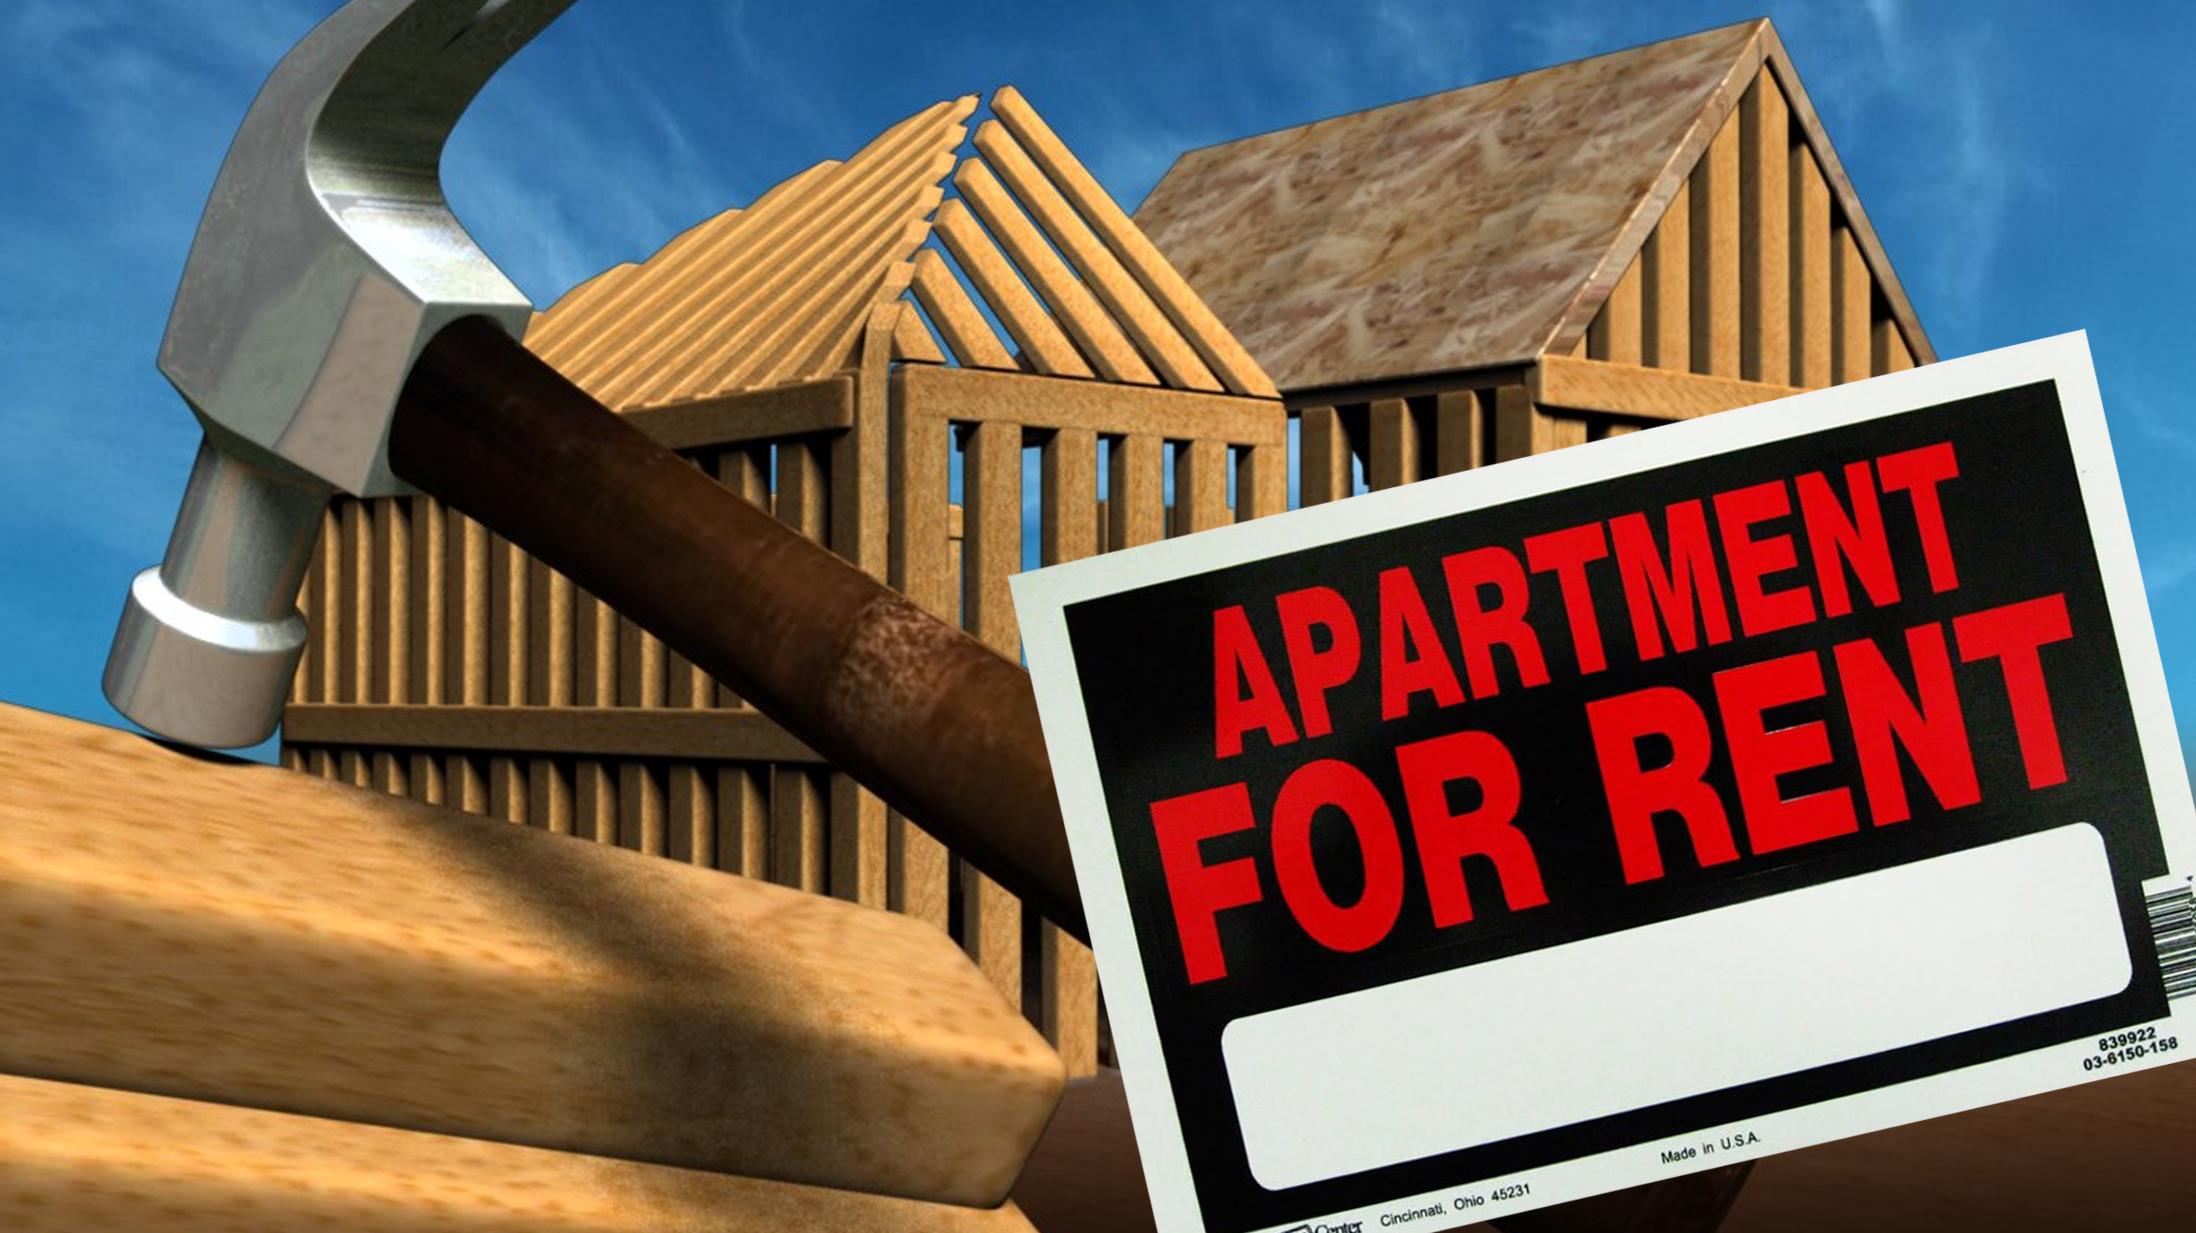 Watkins Glen Apartments PIC FOR WEB_1456529099075.jpg